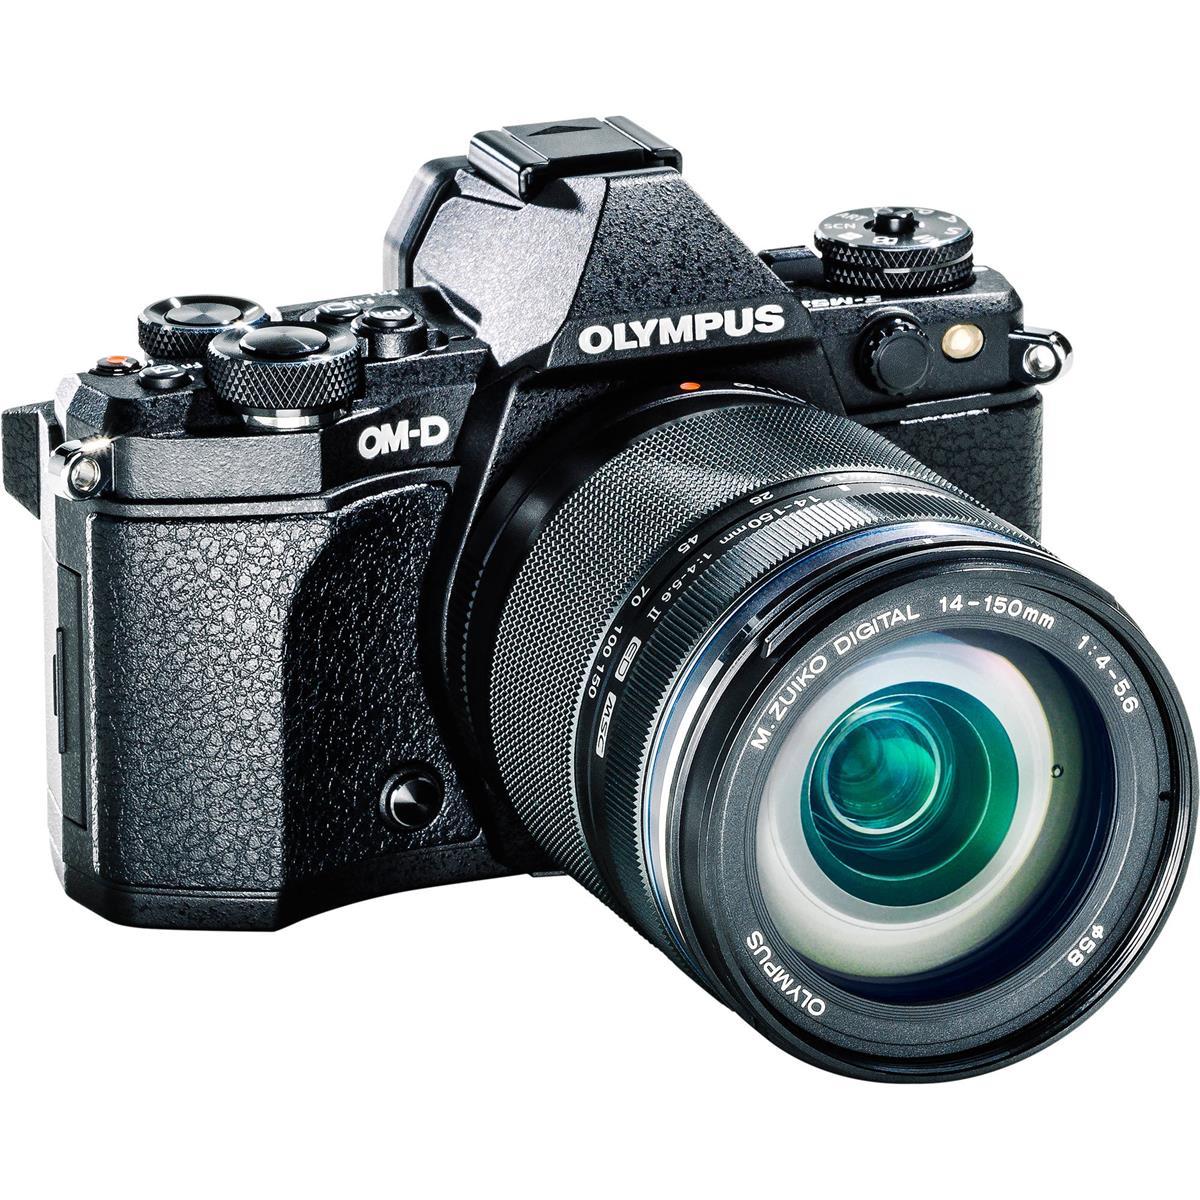 Olympus OM-D E-M5  MarkII Weathersealed  Kit with ED 14-150 f4.0-5.6II (Black)